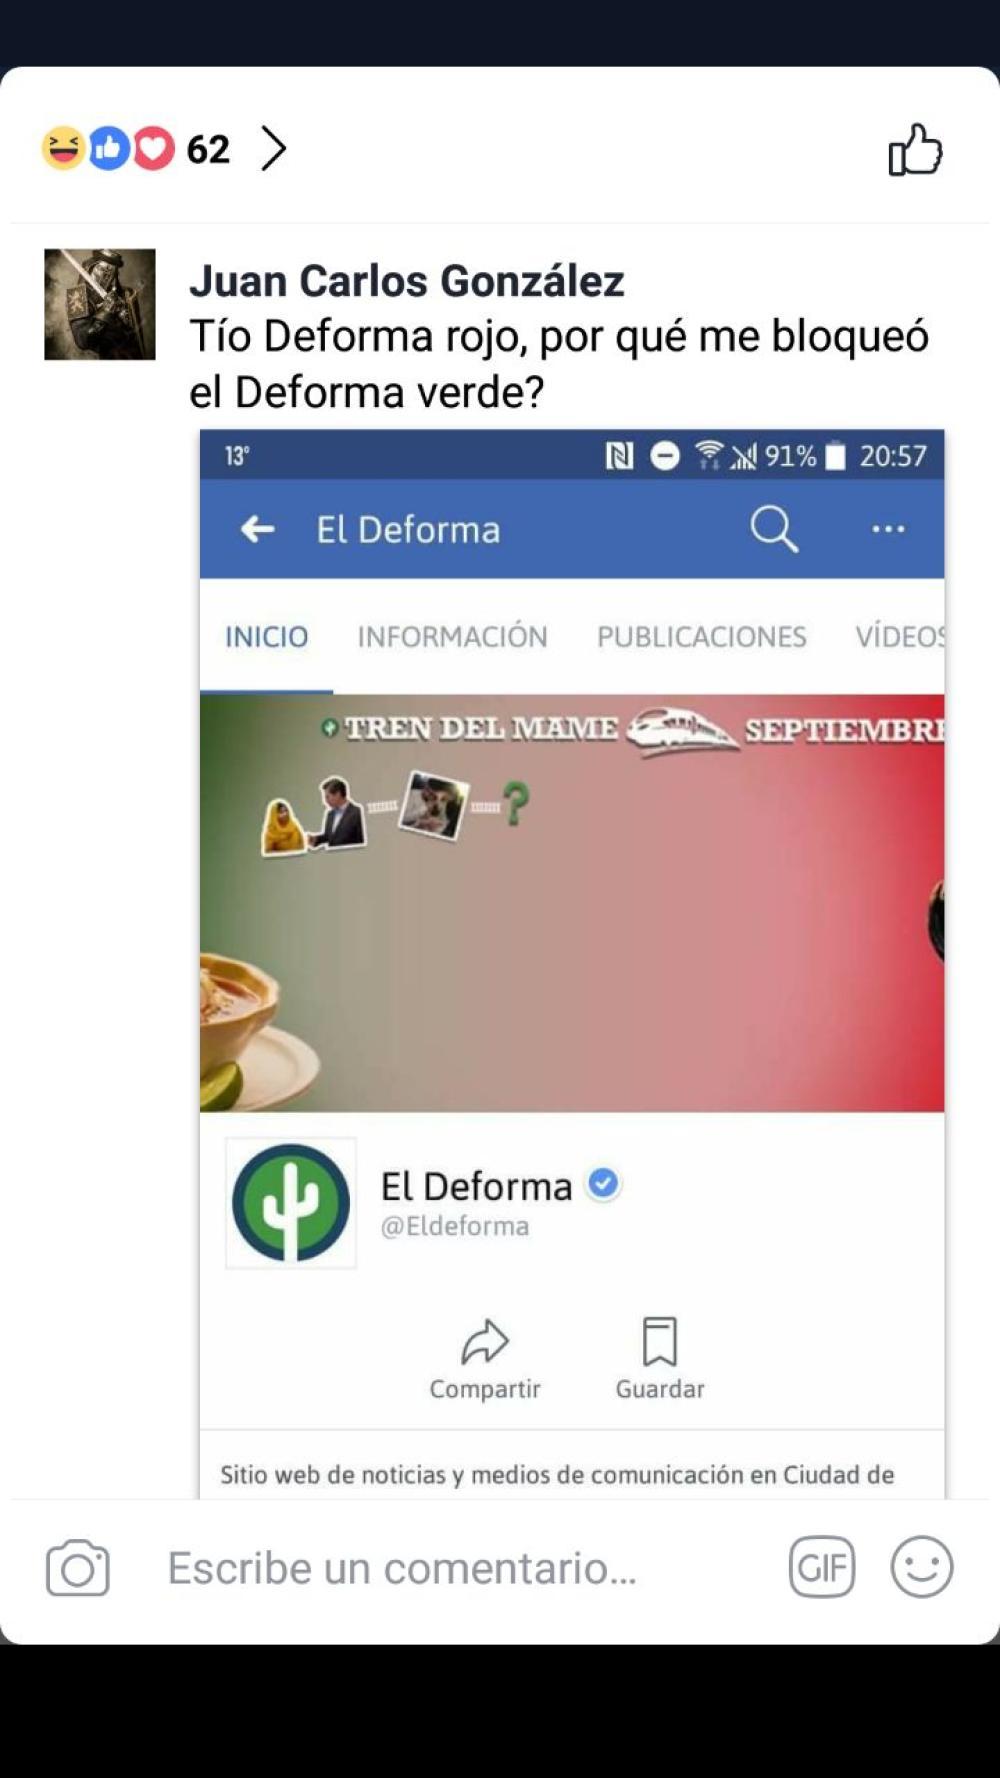 Según reportes, El Deforma empezó a bloquear usuarios